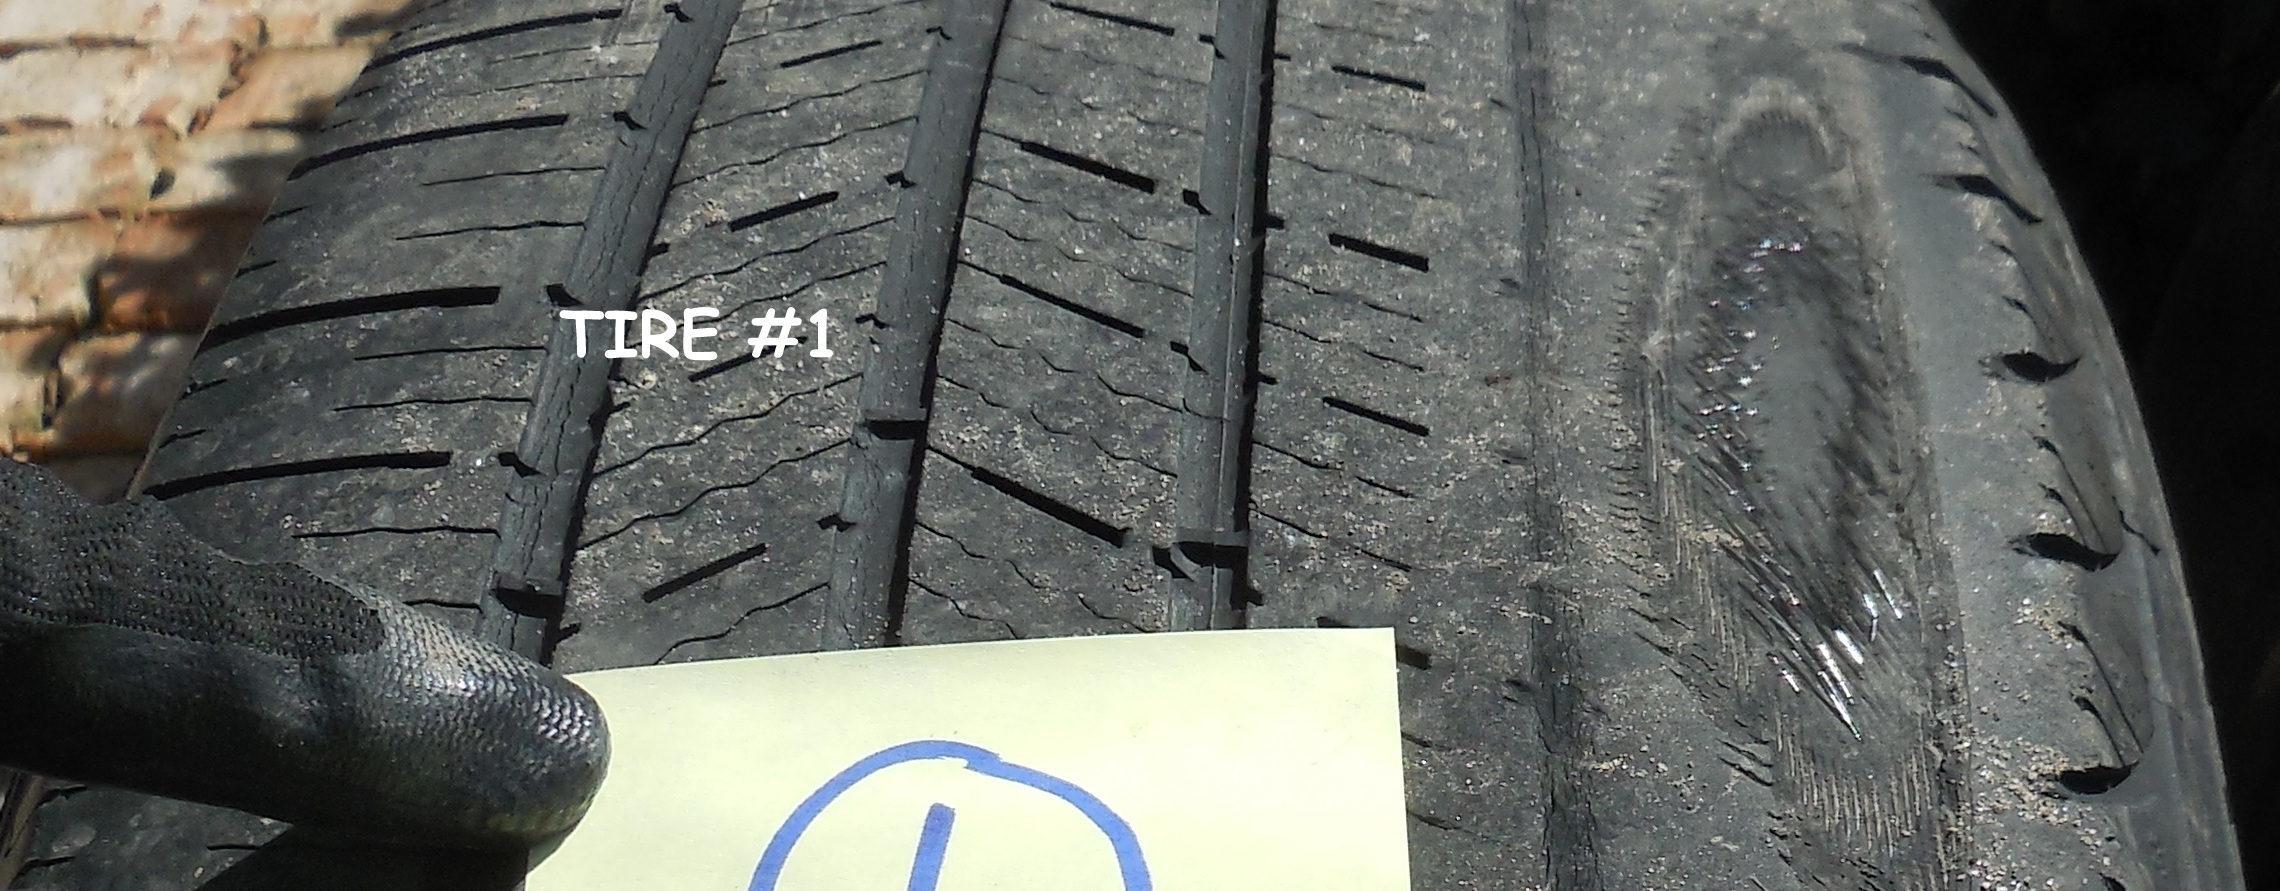 tire rack reviews all season tires